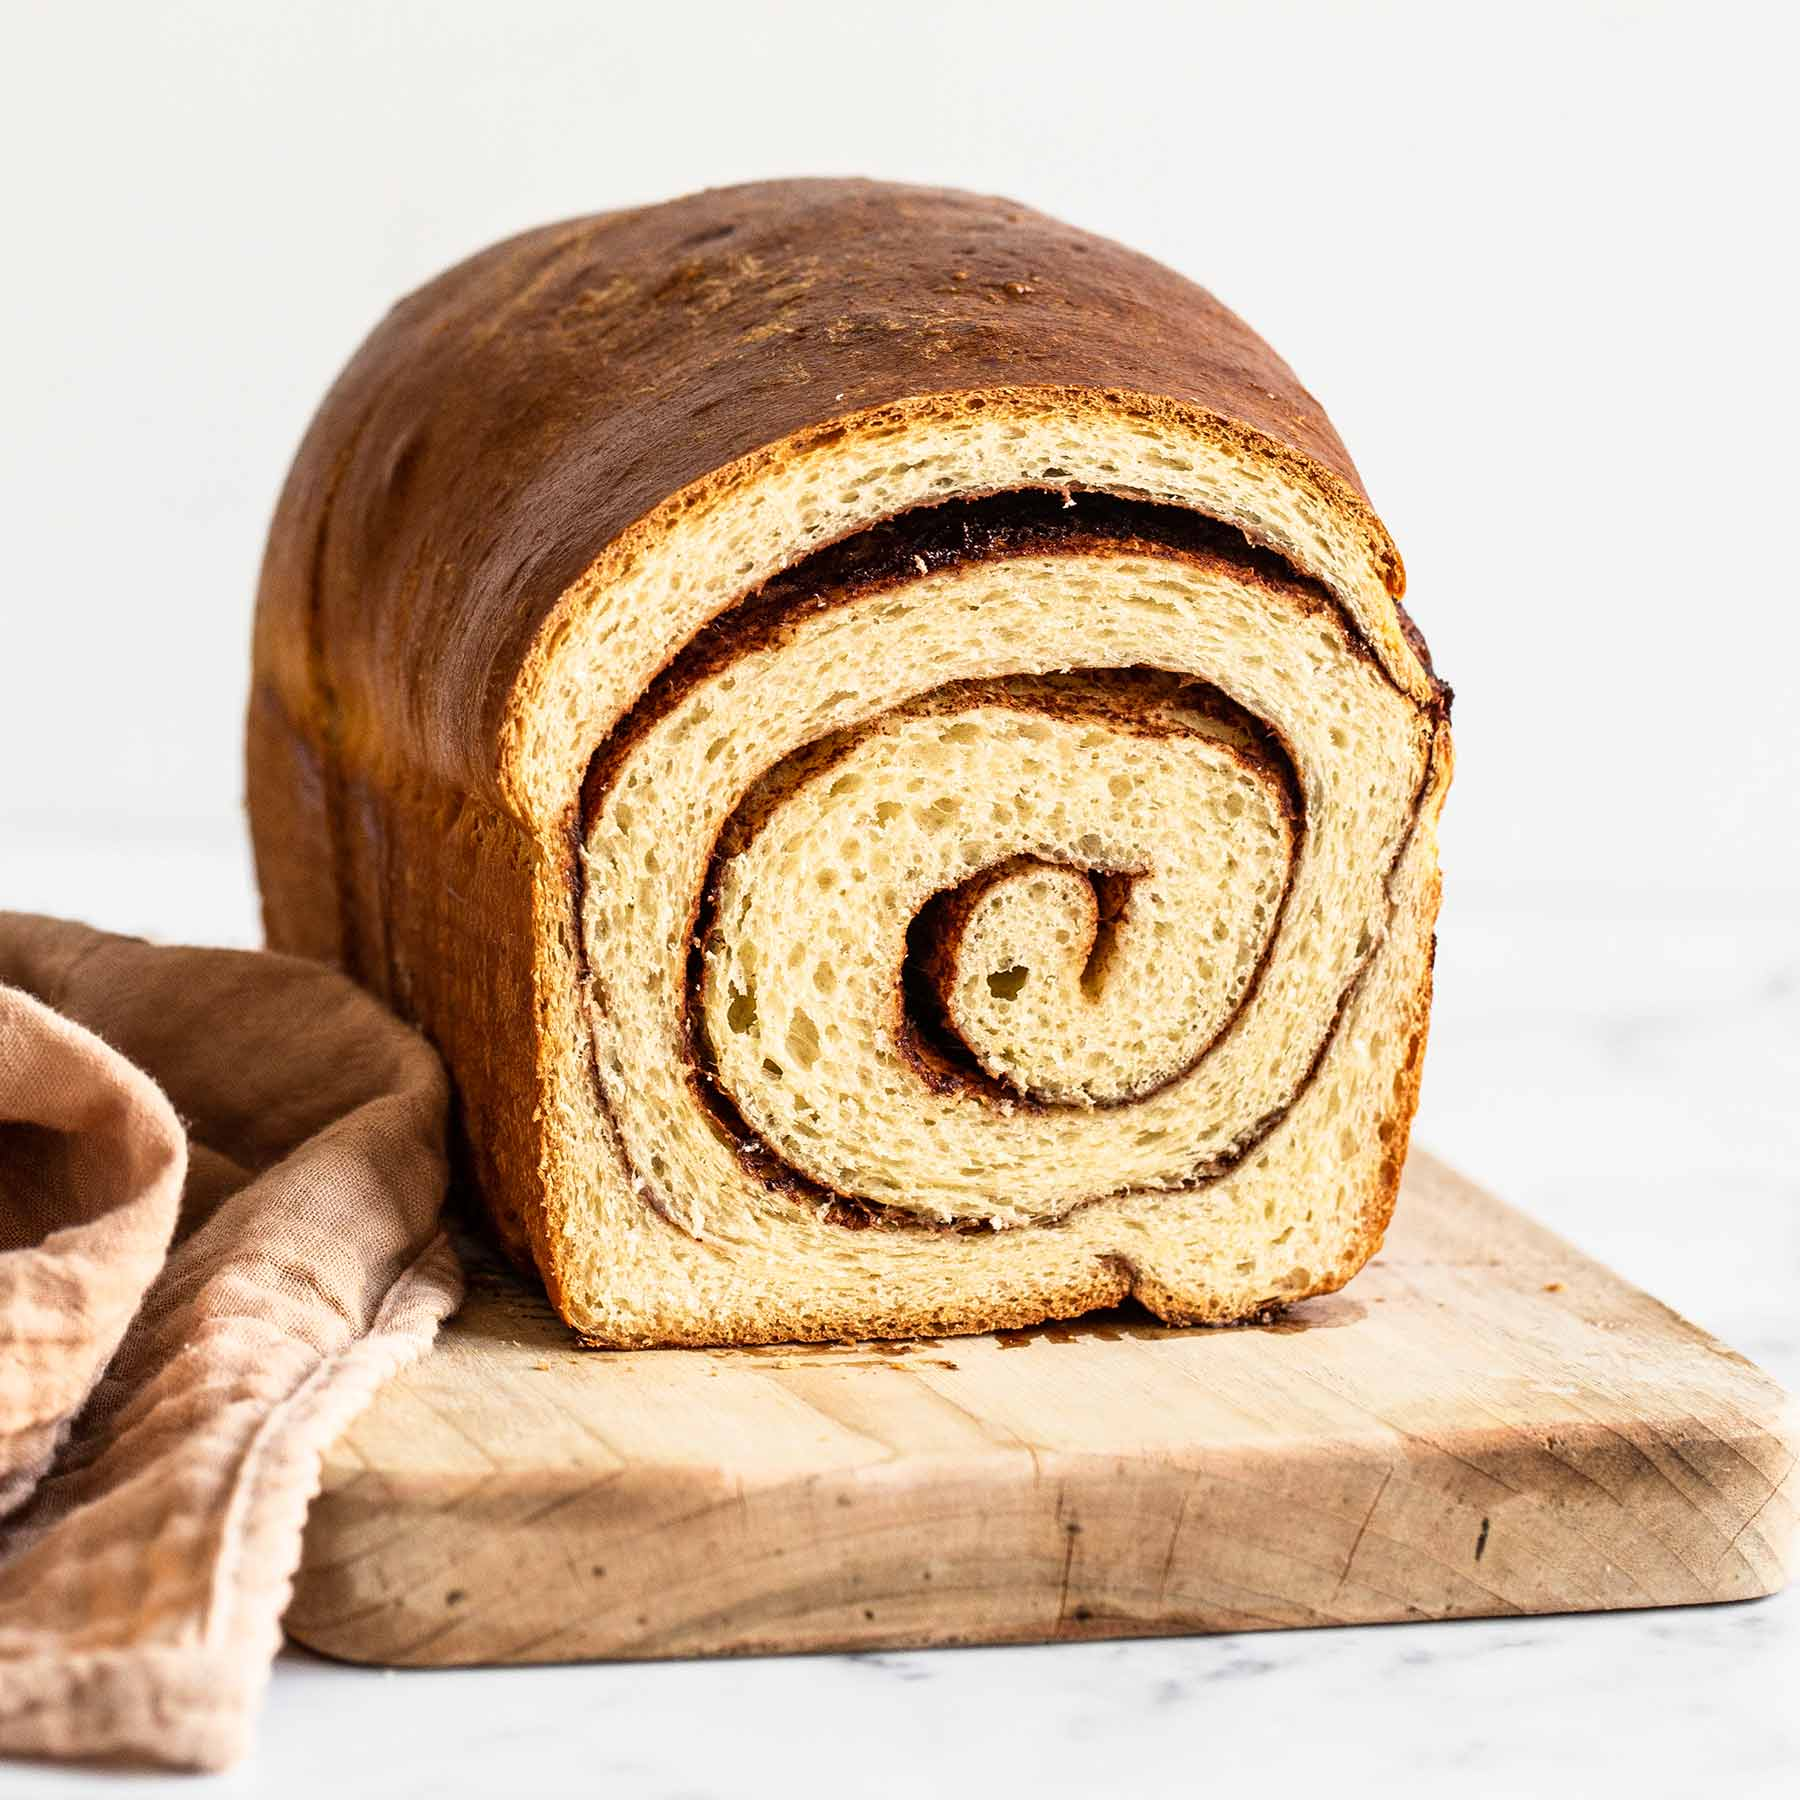 Loaf of homemade cinnamon swirl bread